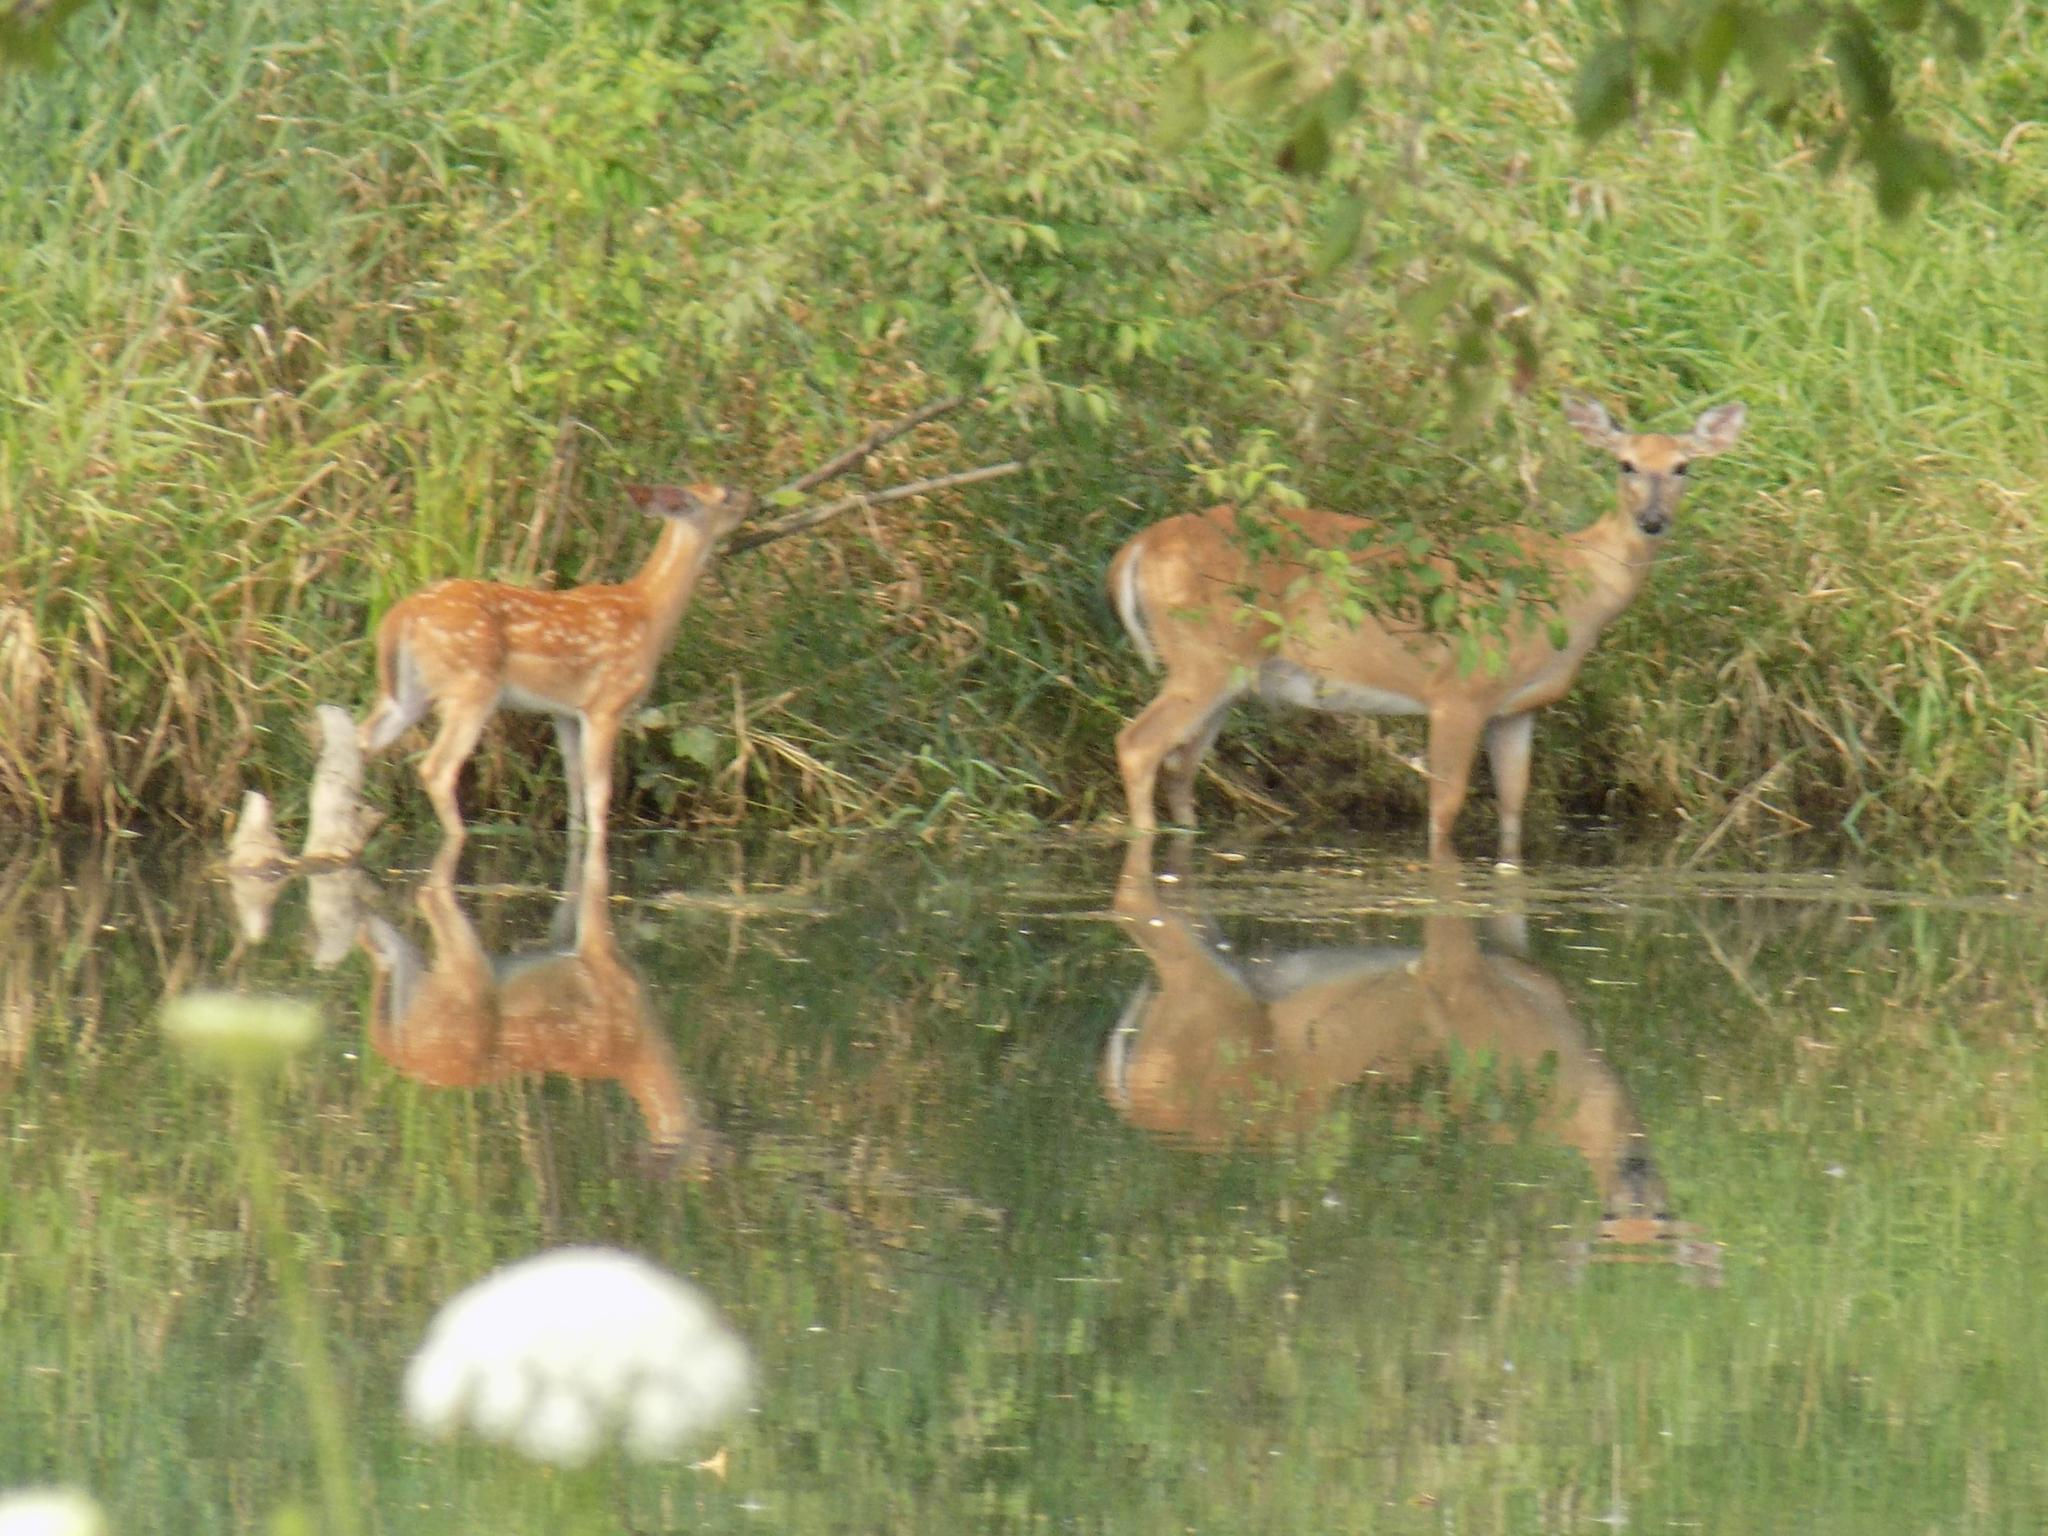 Mama Deer & Her Twins by Lori Enfield